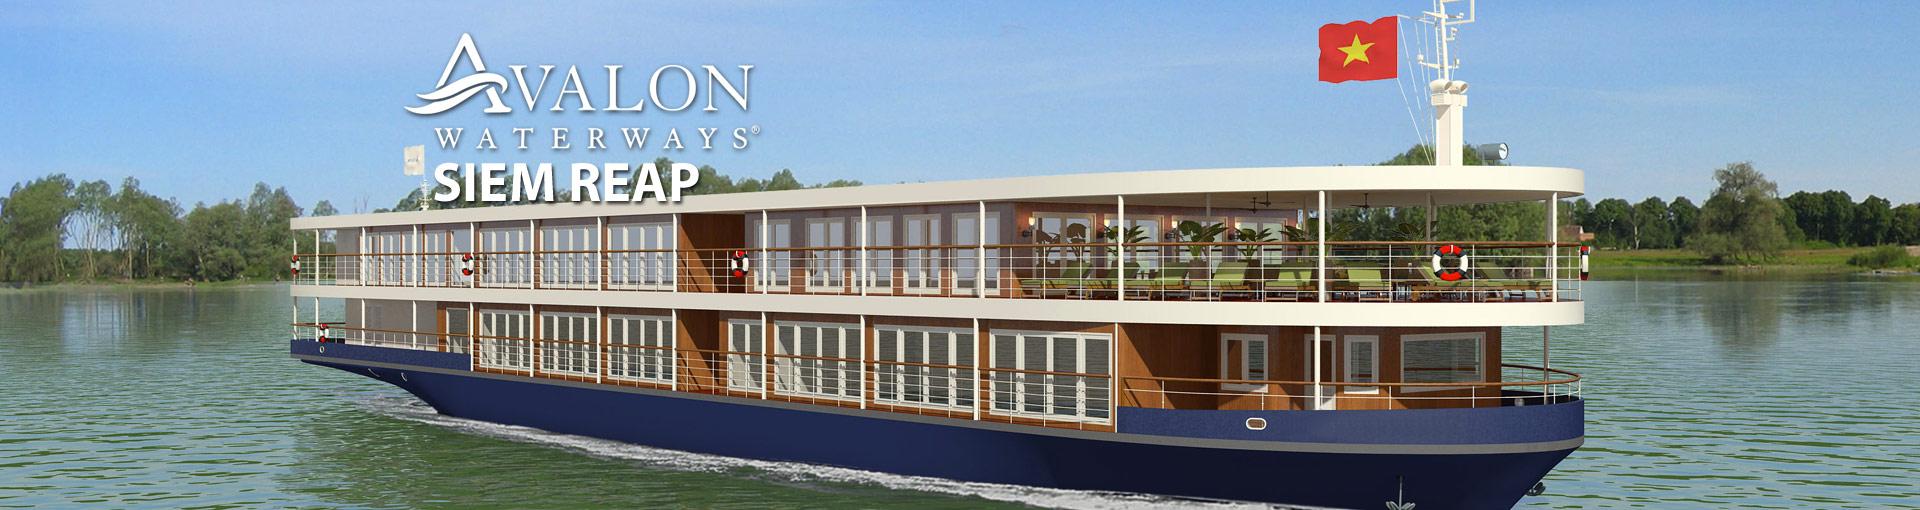 Avalon Siem Reap River Cruise Ship